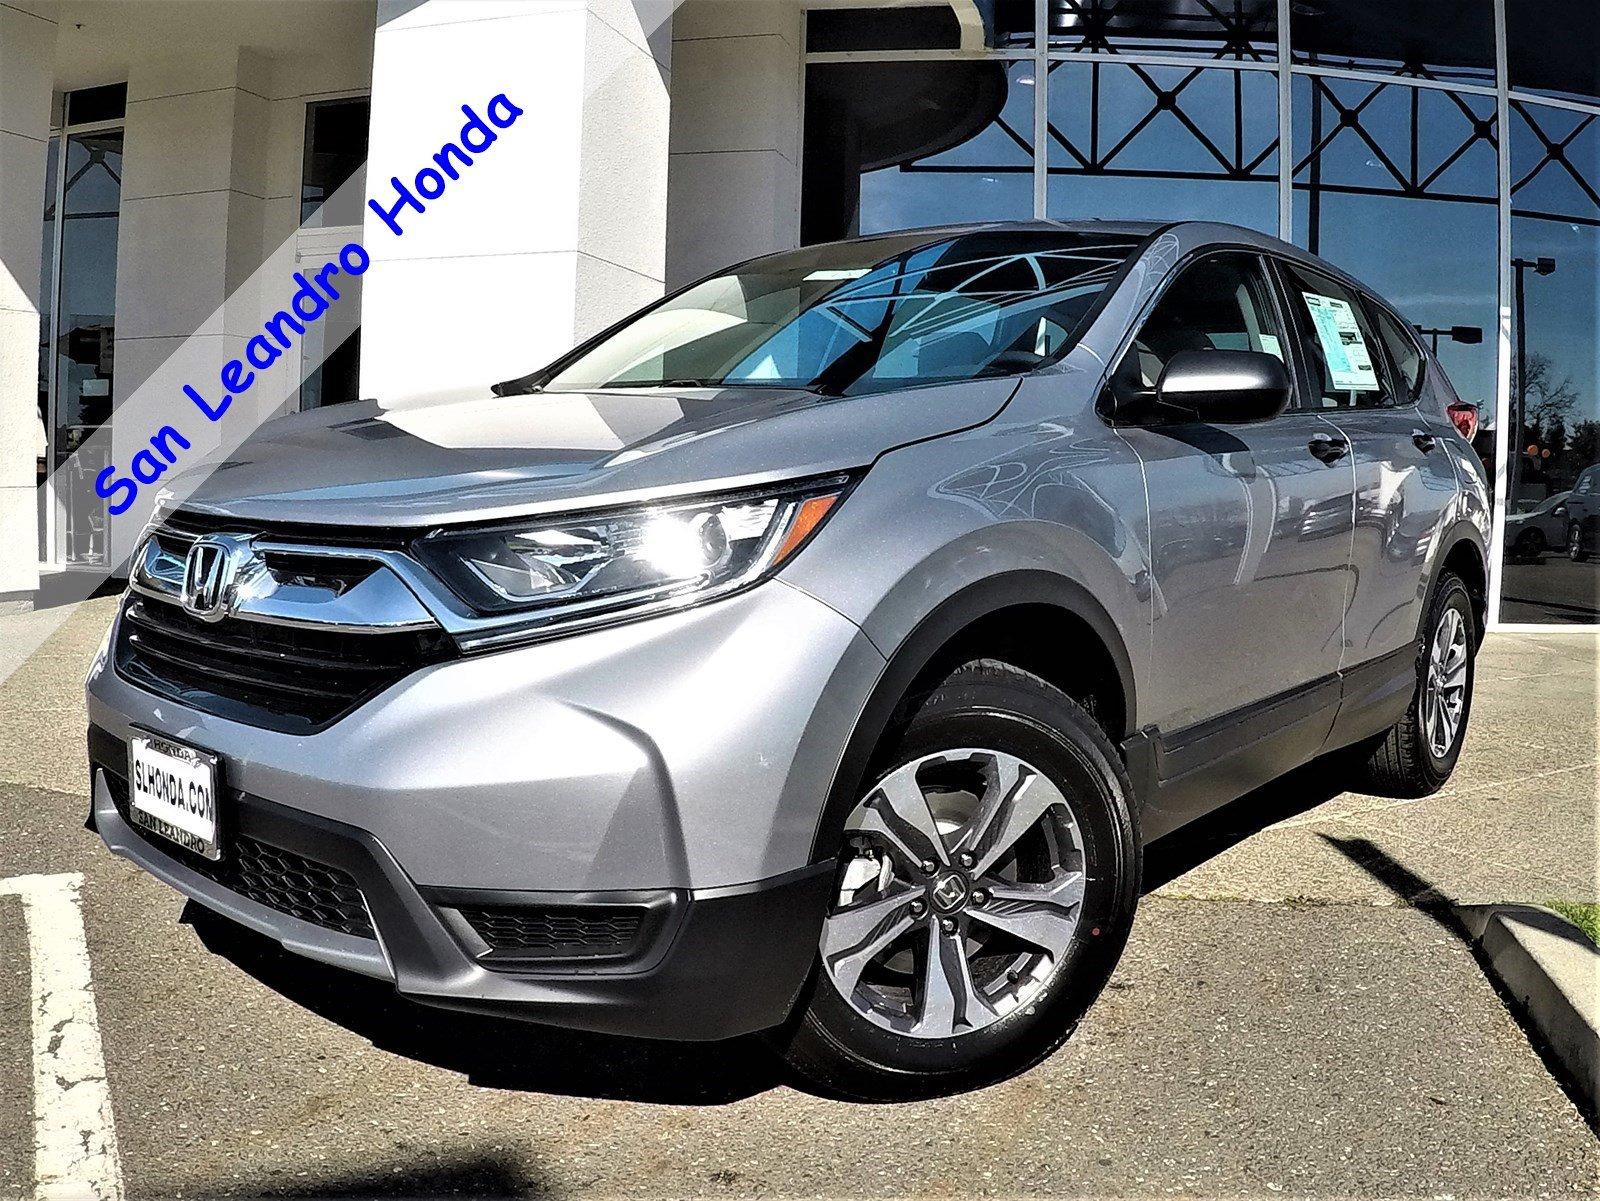 San Leandro Nissan Specials >> Presidents Day Sale 2018 Honda Cr V Lx Awd 42138 Specials Deals